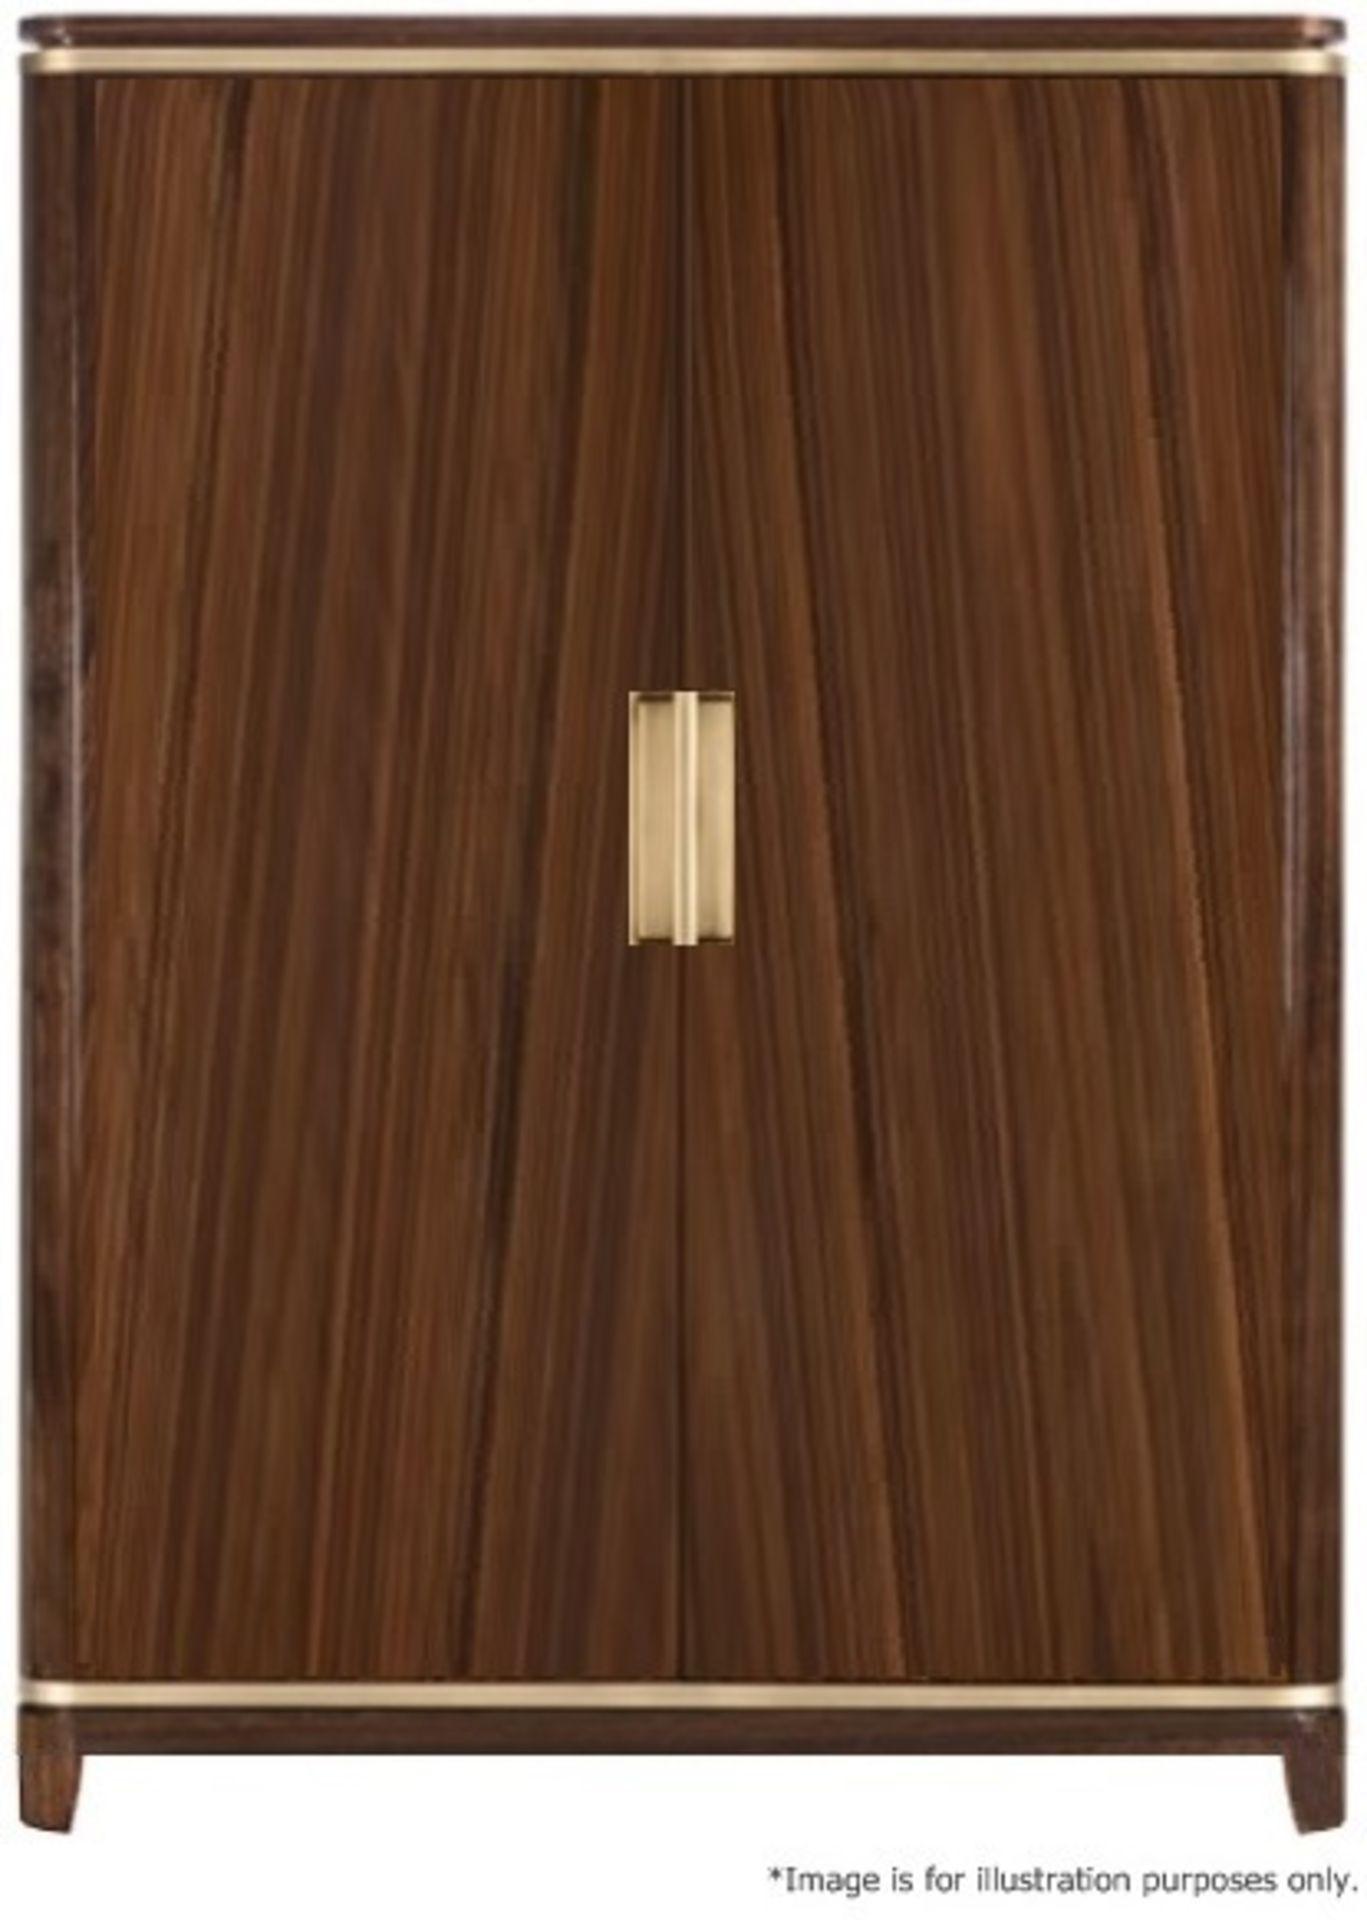 1 x FRATO Bespoke 'Siena' Wardrobe With A High Gloss Brown Wood Veneer Finish - Original RRP £18,890